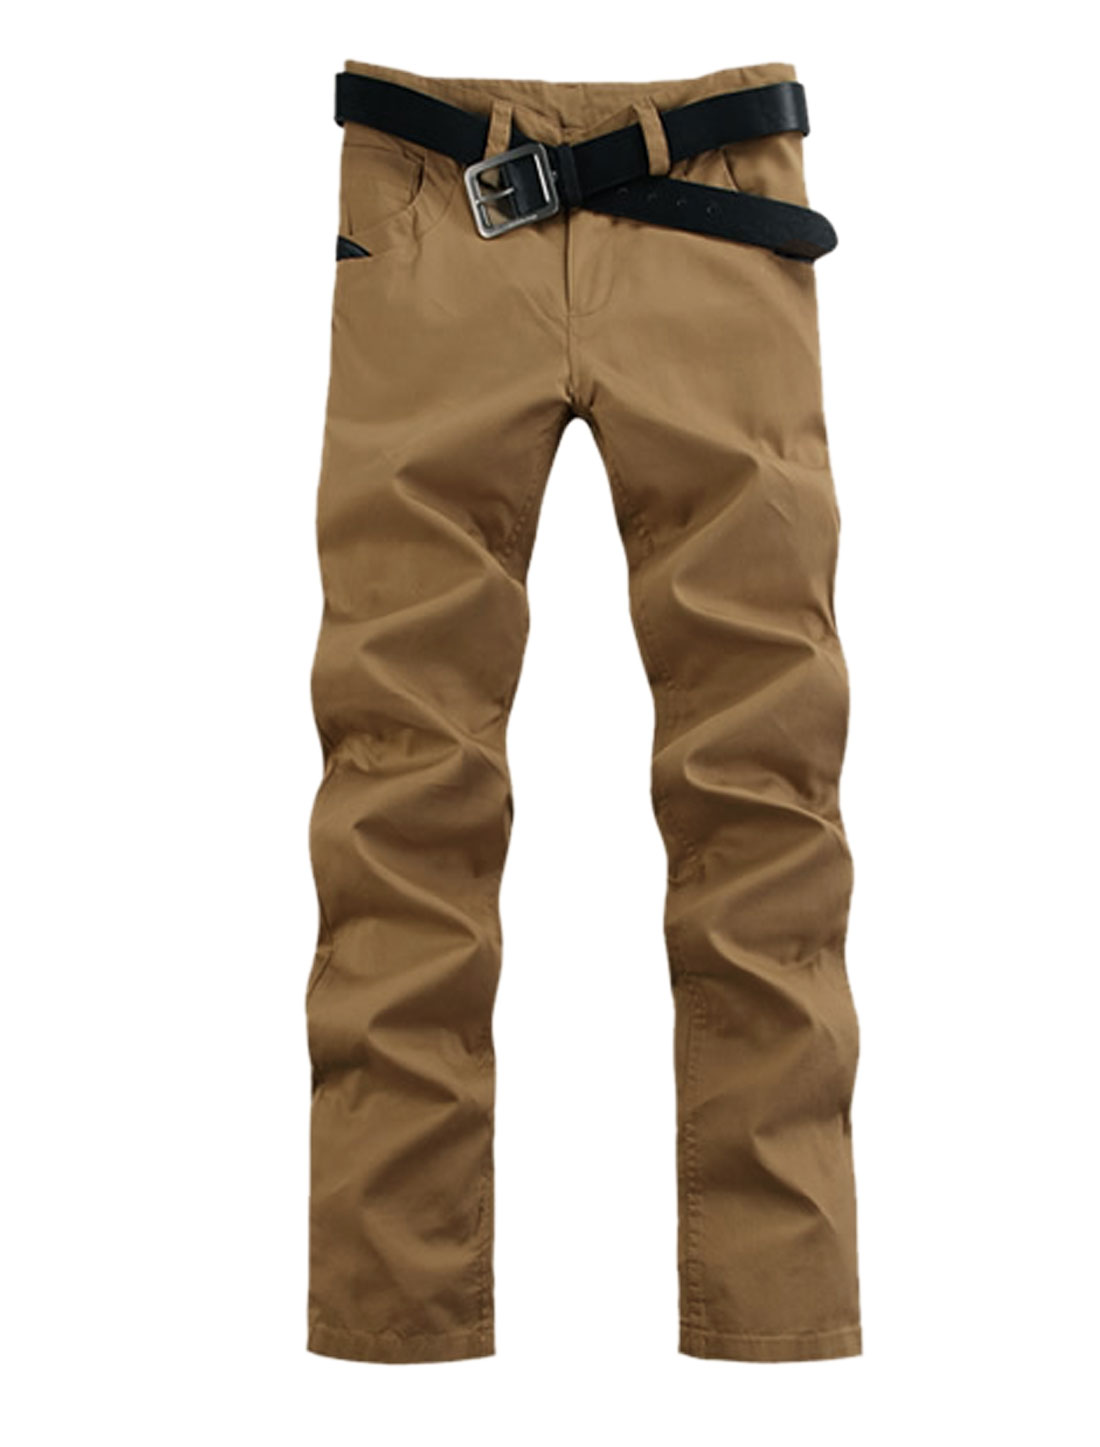 Men Belt Loop Zip Up Imitation Leather Casual Pants Khaki W40